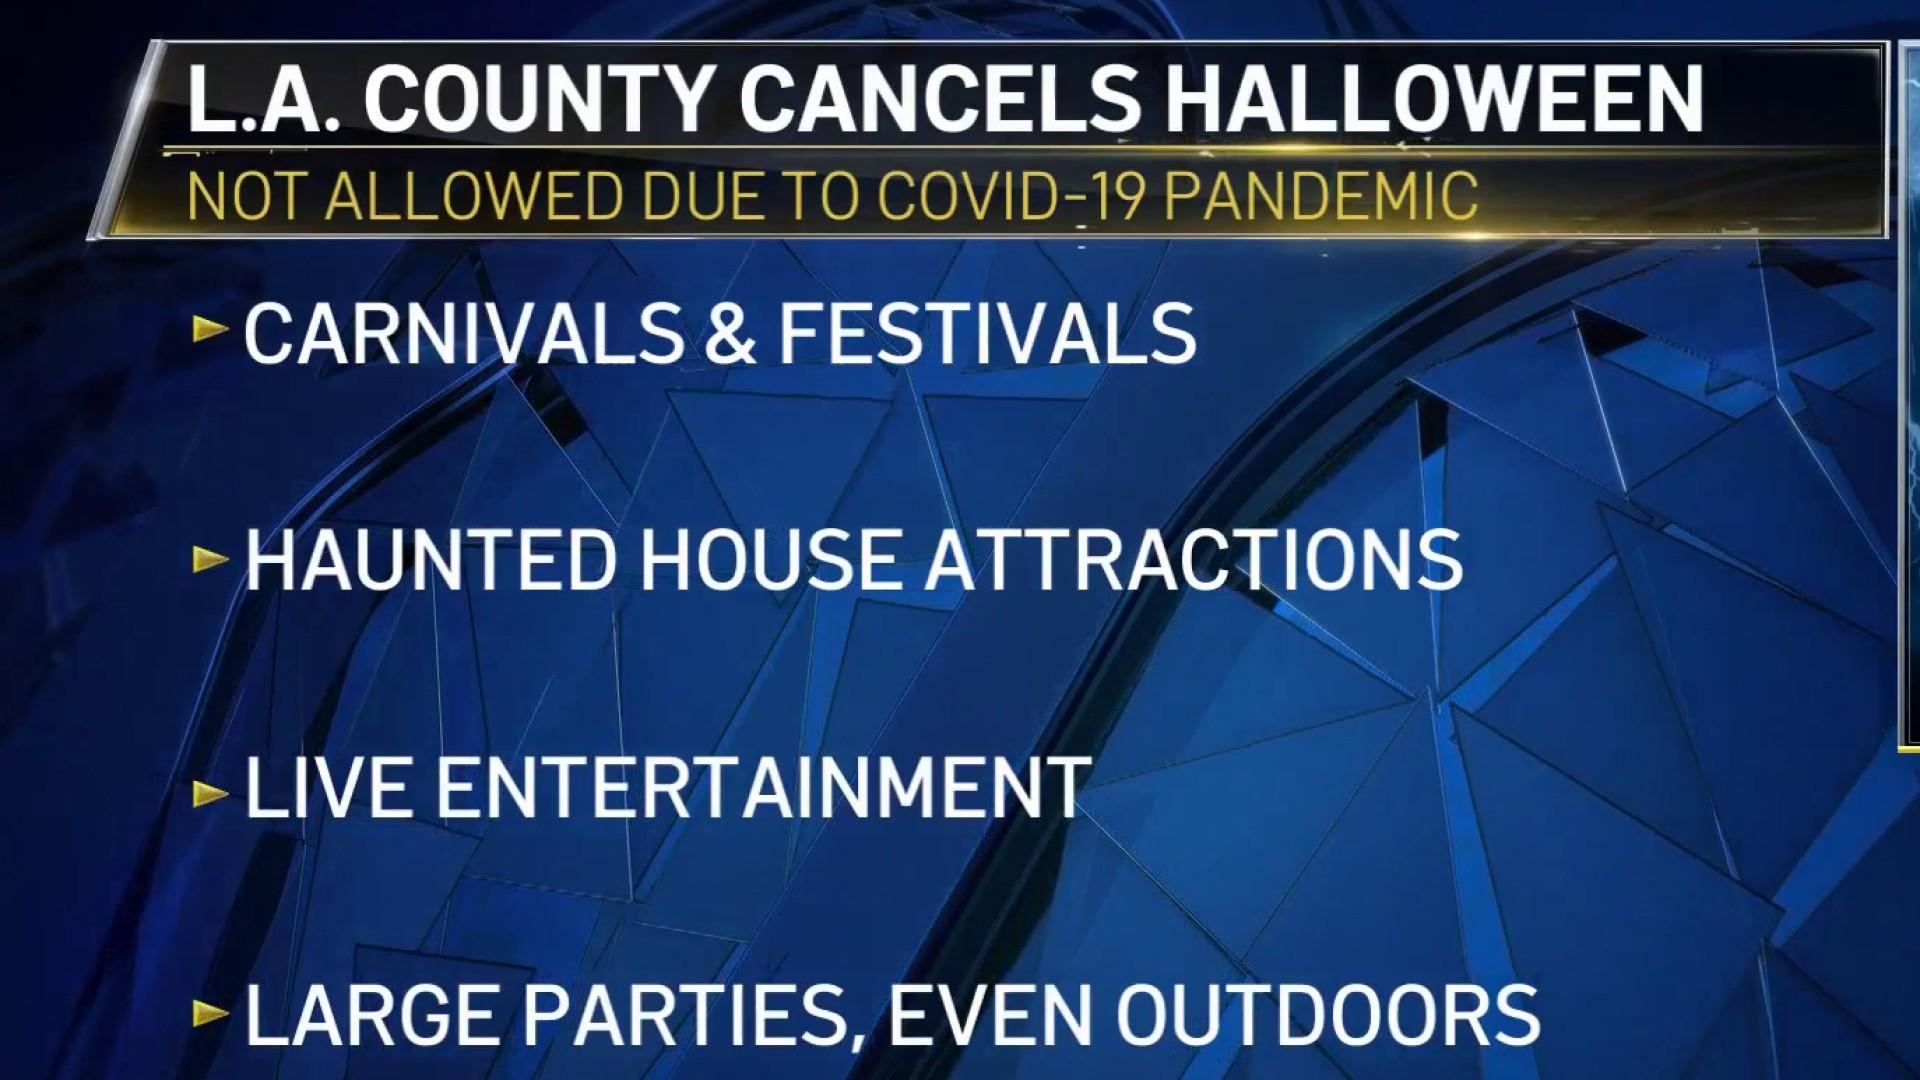 Halloween Bikes Los Angeles 2020 LA County Cancels Halloween – NBC Los Angeles